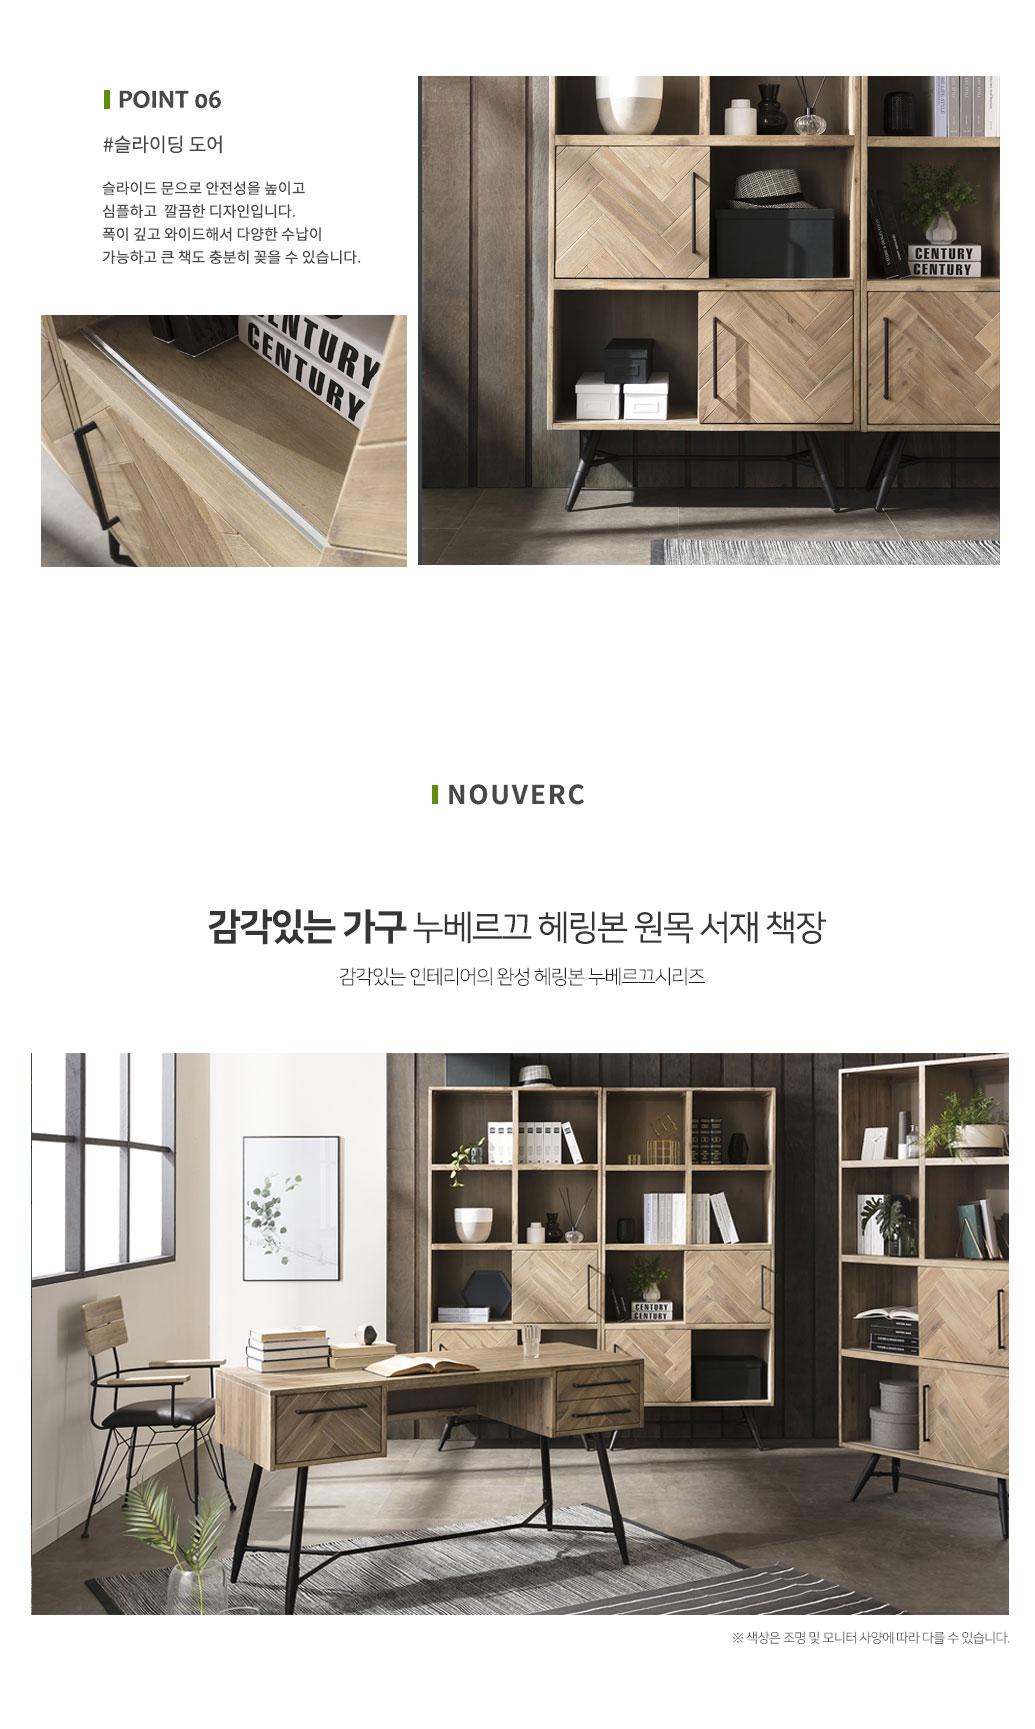 nouverc_bookcase_06.jpg